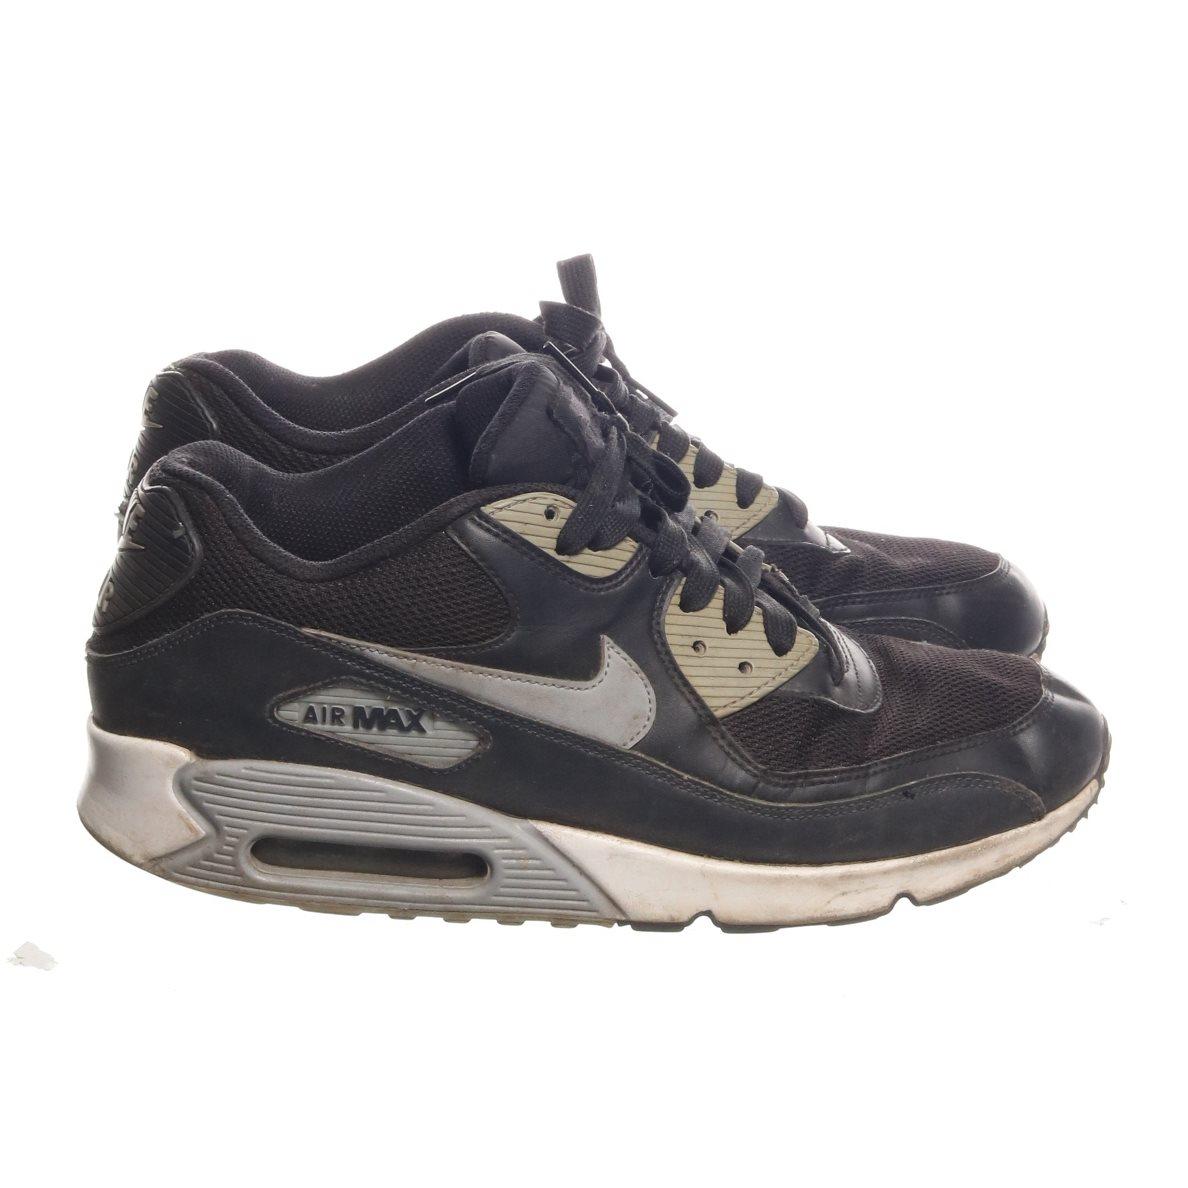 huge selection of e4c74 307dc Nike, Sneakers, Strl  44, Air Max, Svart Beige Grå